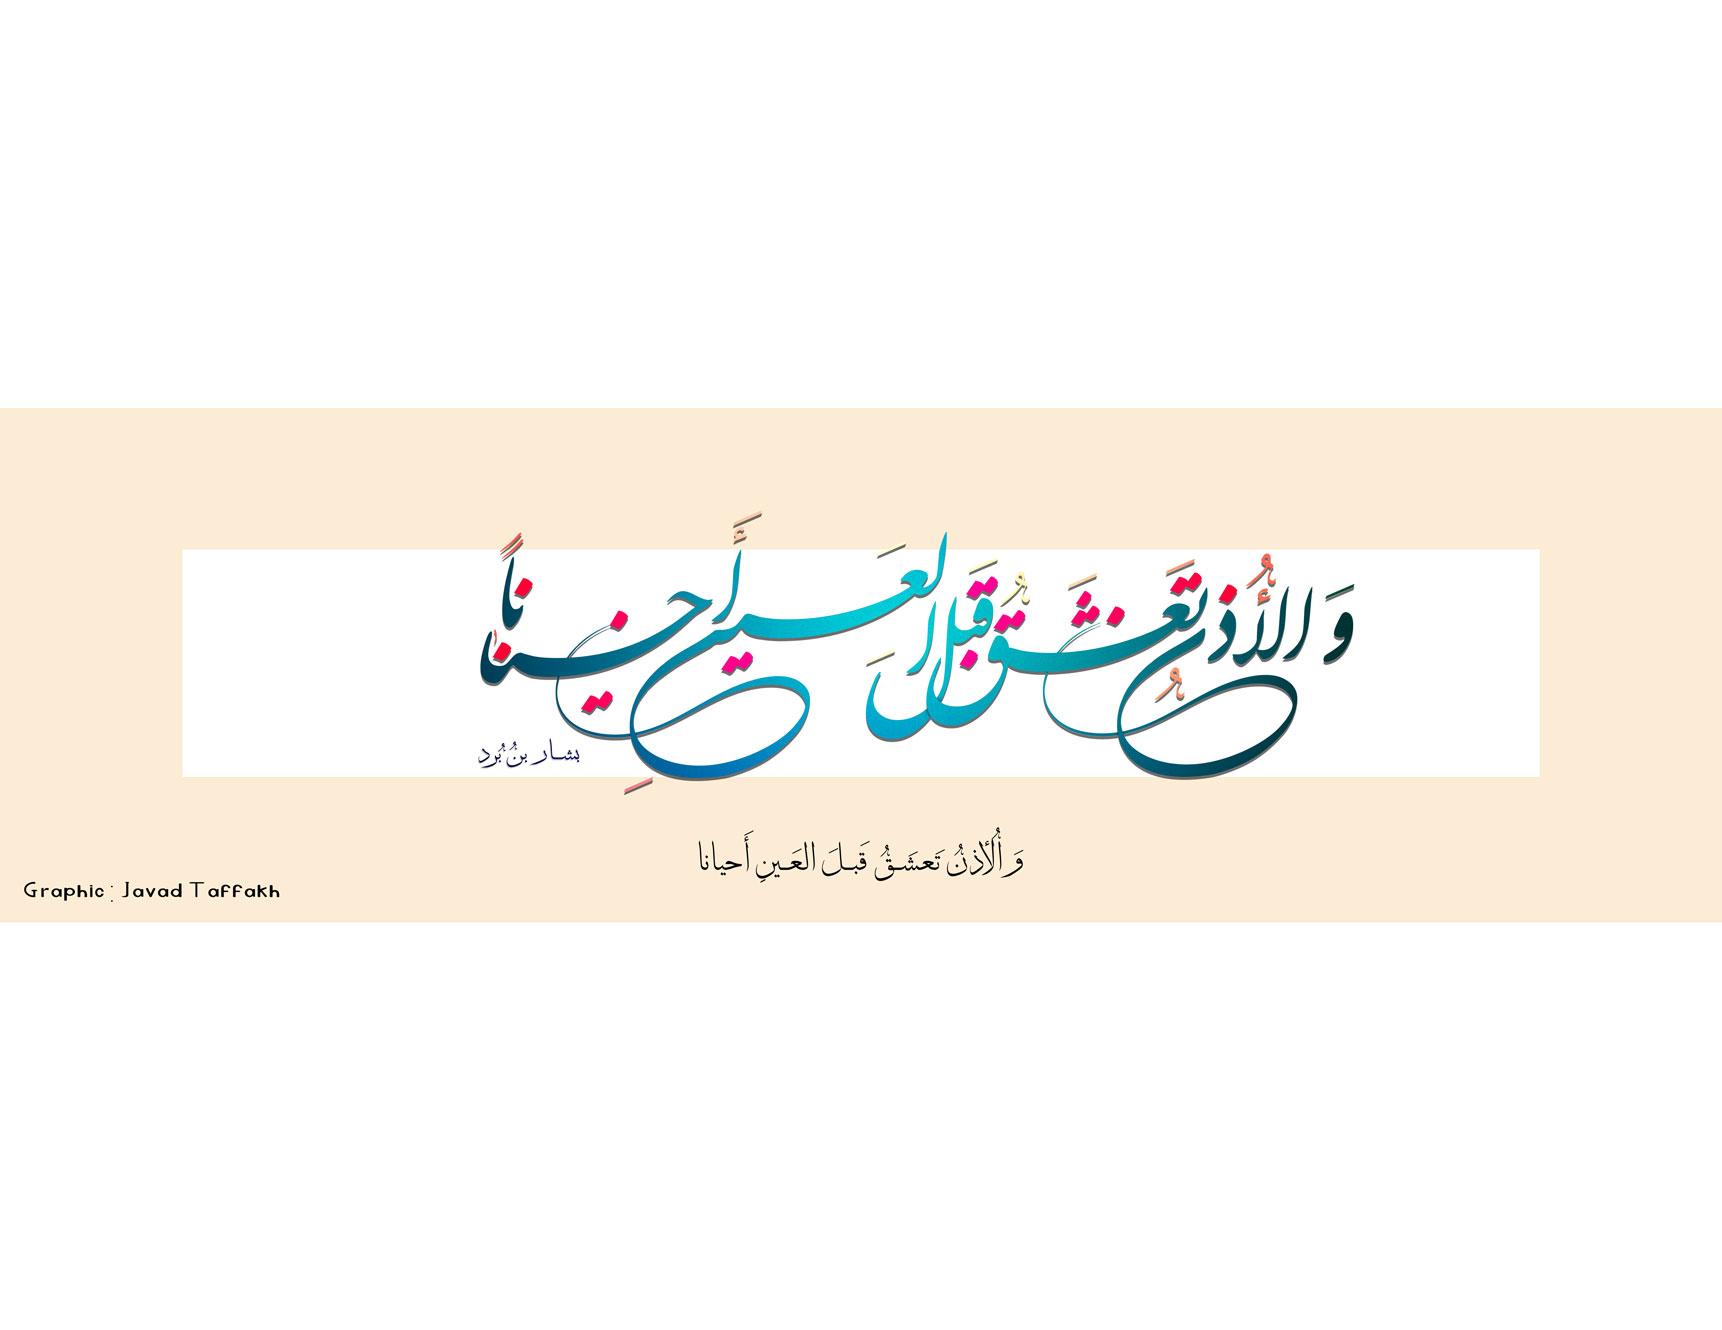 دانلود کالیگرافی زیبای شعر عربی وَ الأُذنُ تَعشَقُ قَبلَ العَینِ أَحیانا